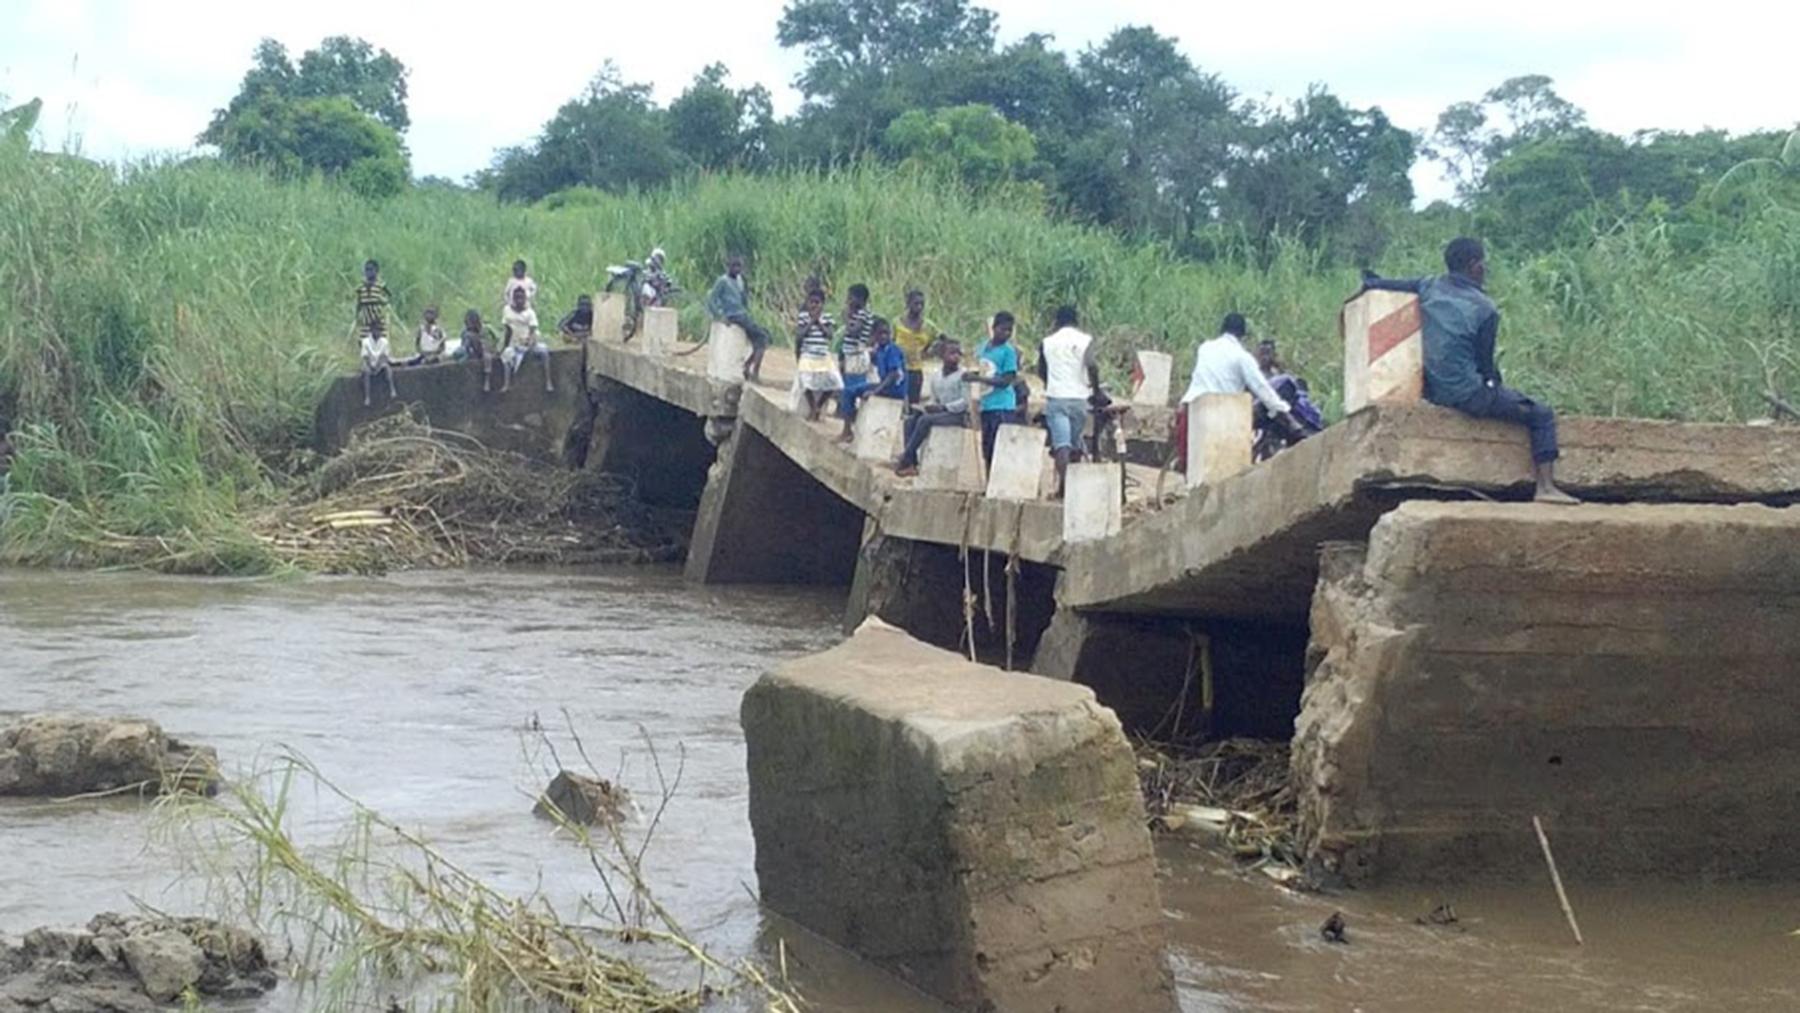 People cross a Cyclone Idai-damaged bridge in Zambezia Province, Mozambique. (Photo courtesy of the Real Medicine Foundation)